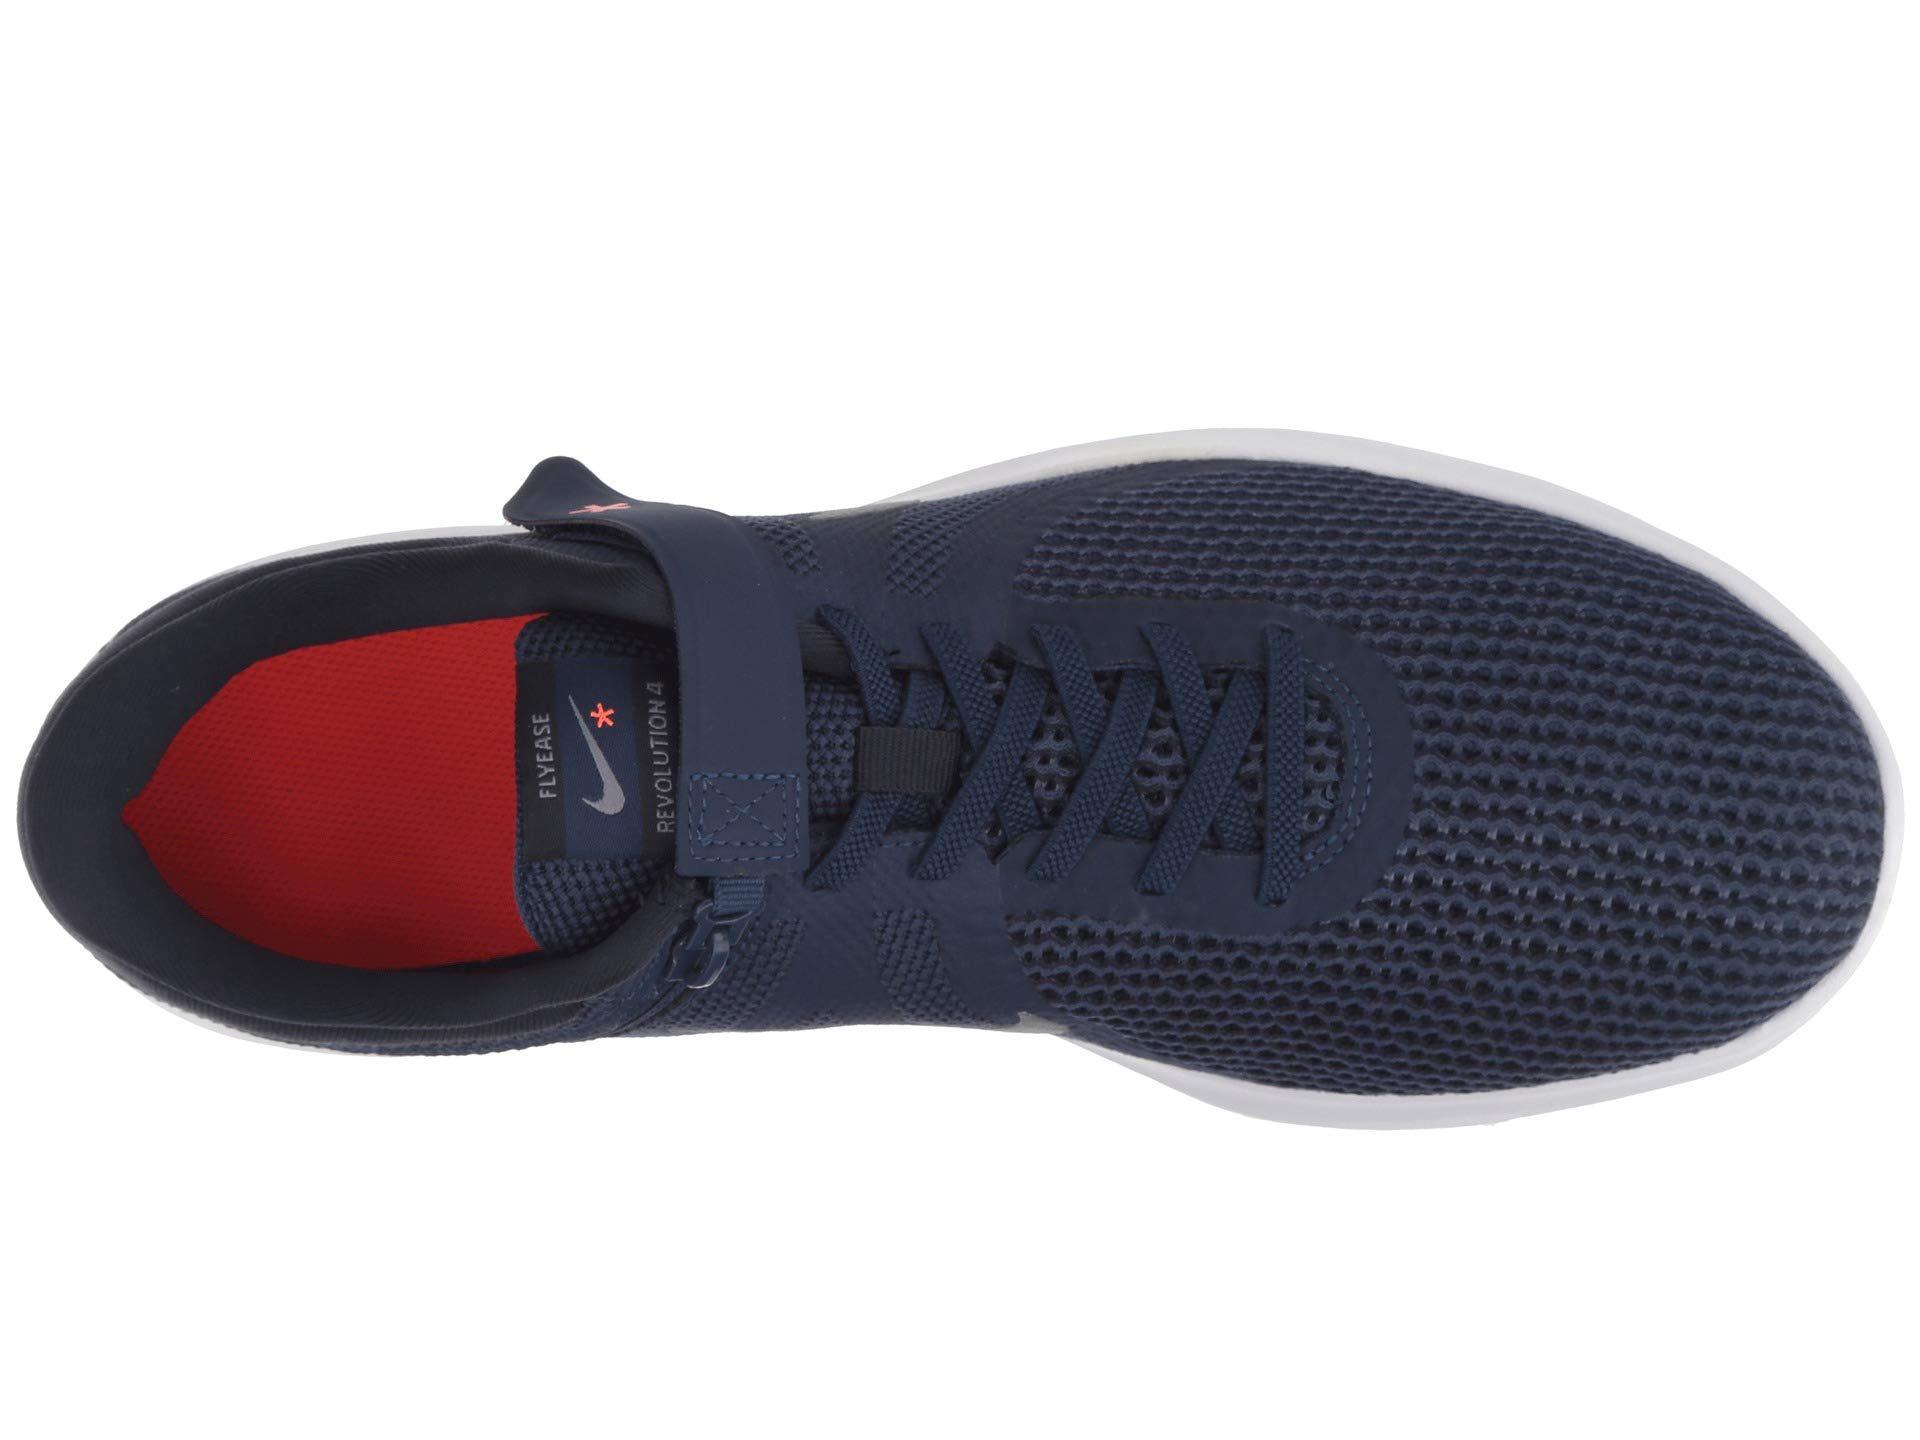 e5626eb5ffc9 Lyst - Nike Revolution 4 Flyease (black white anthracite total ...